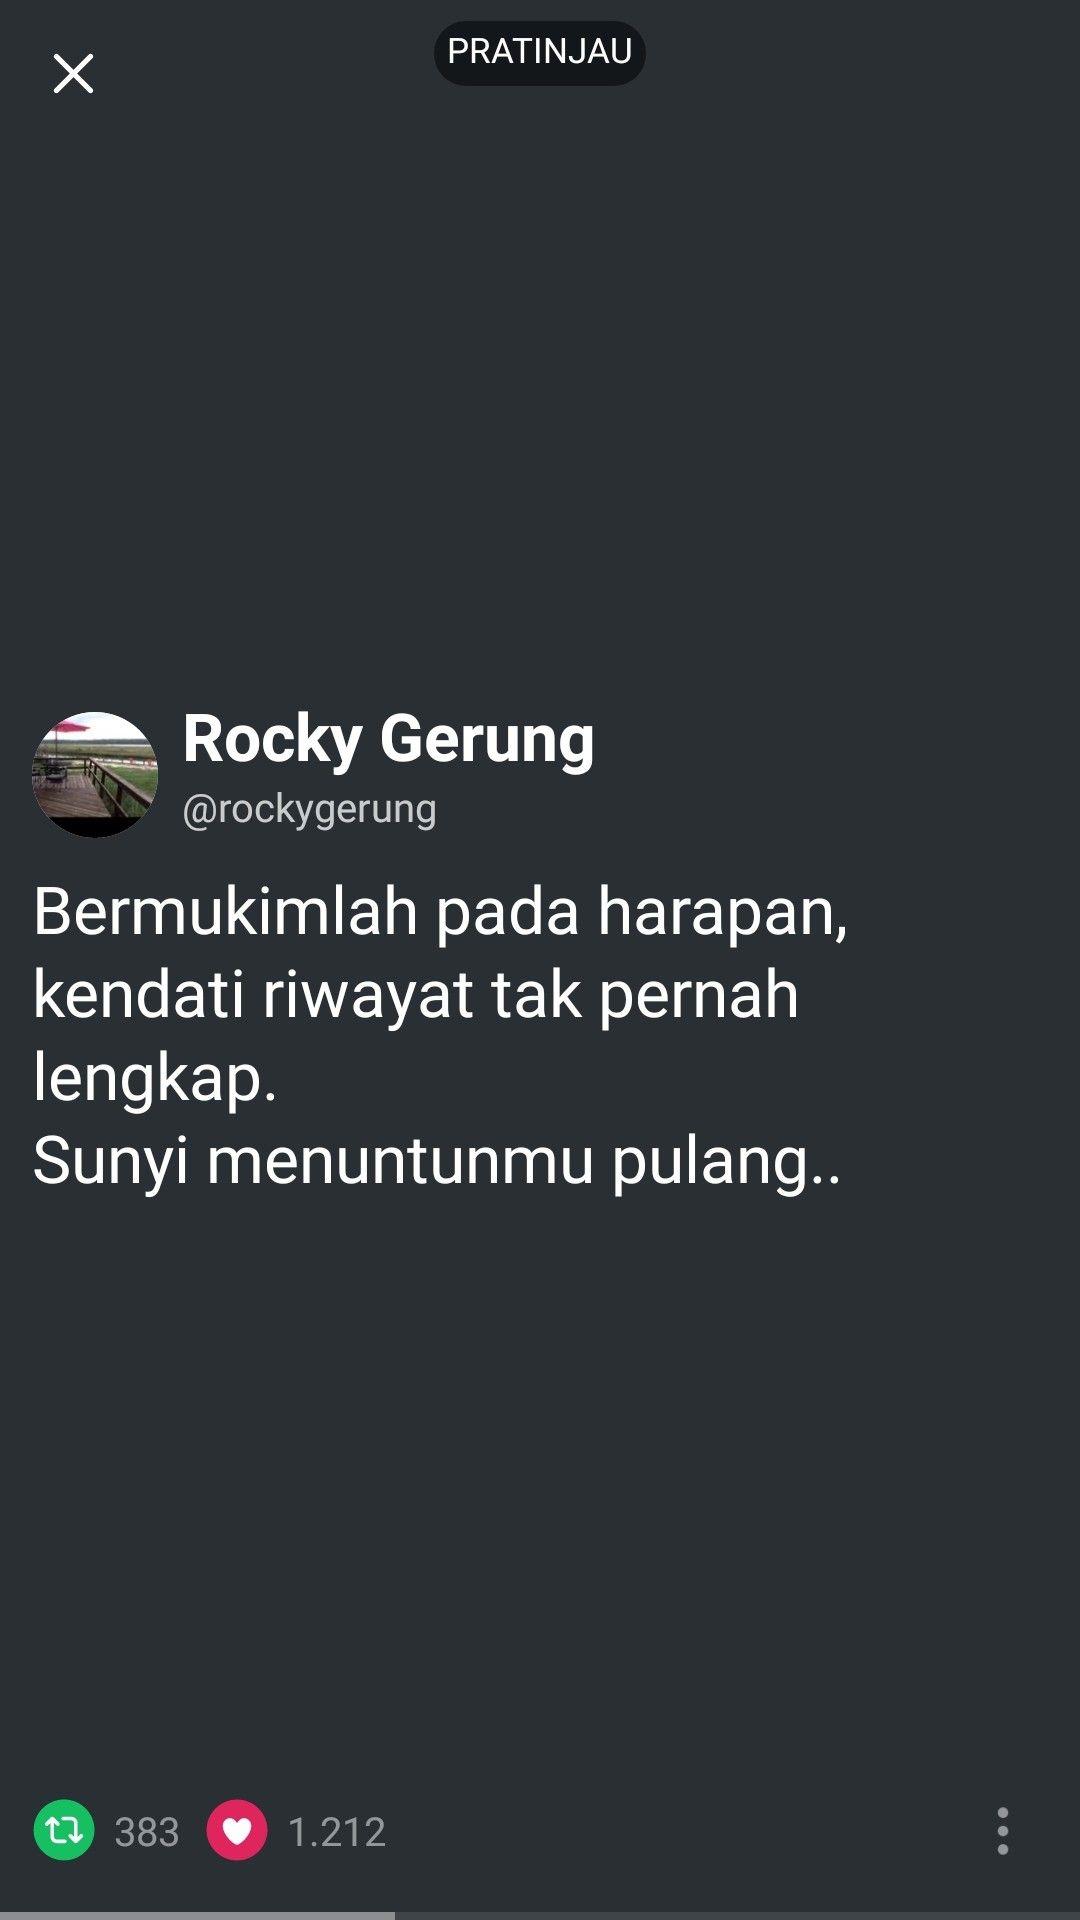 Rocky Gerung Dengan Gambar Kutipan Motivasi